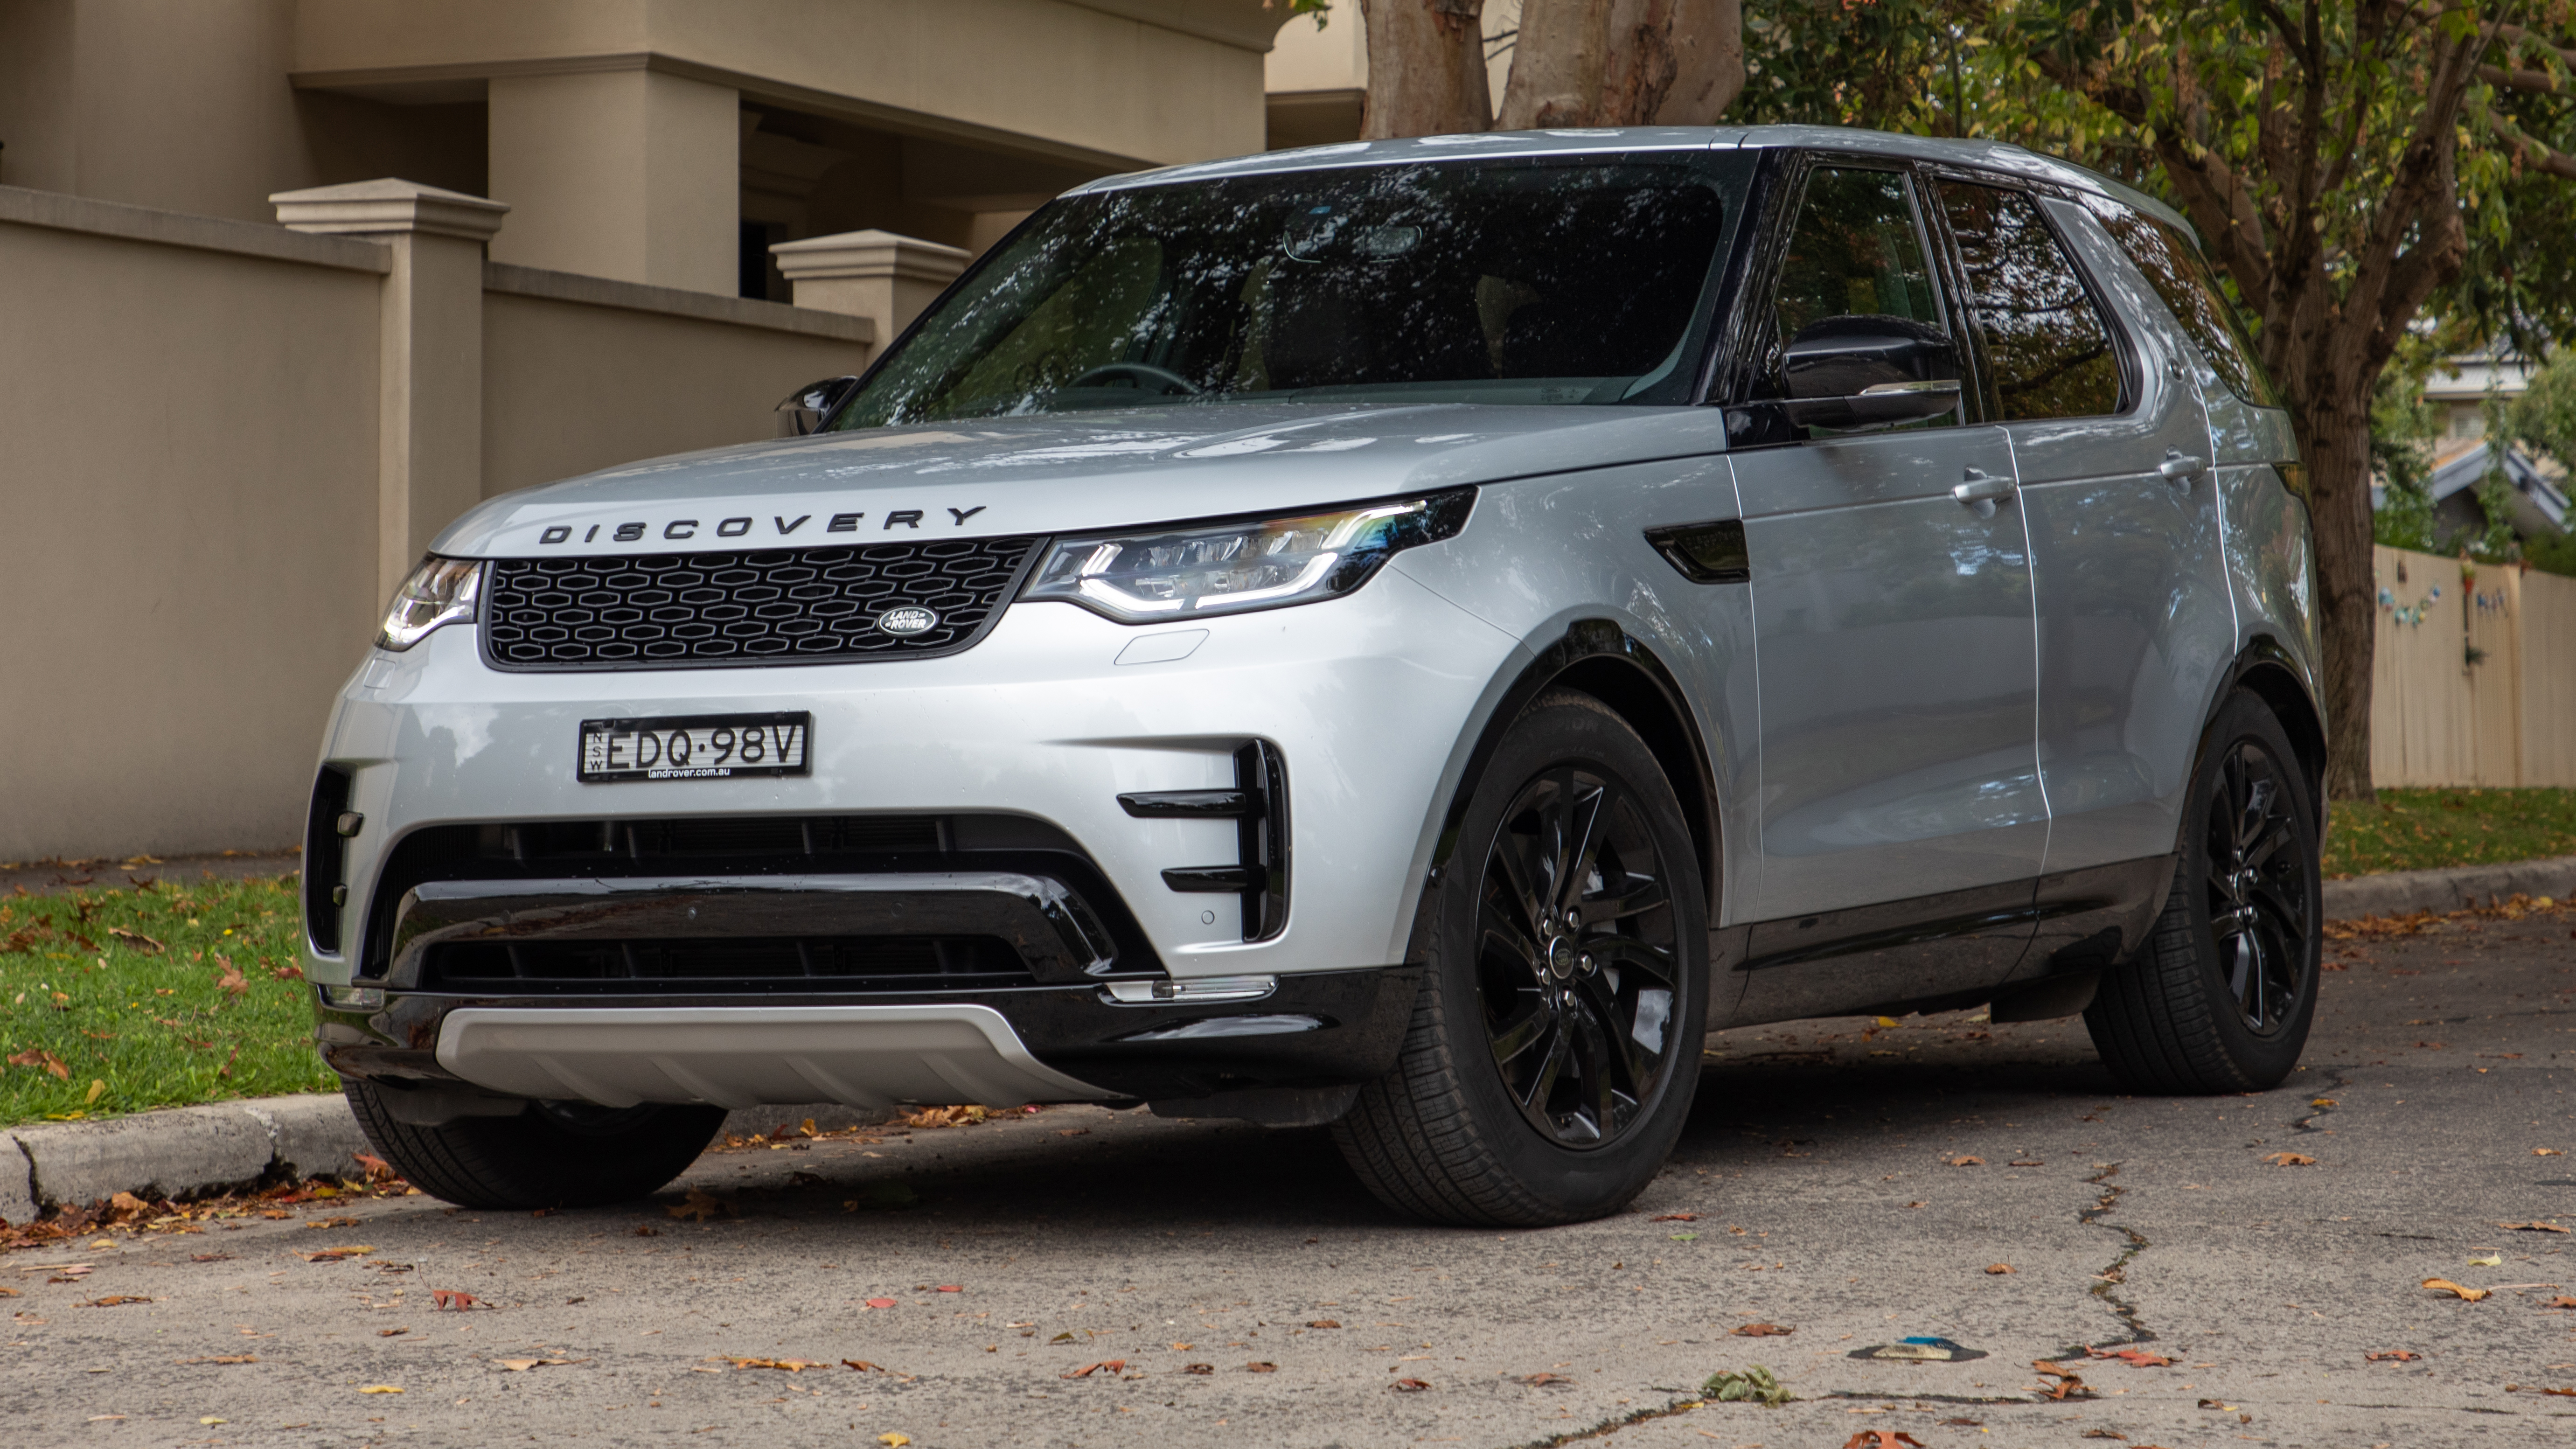 2020 Land Rover Discovery Landmark SDV6 review